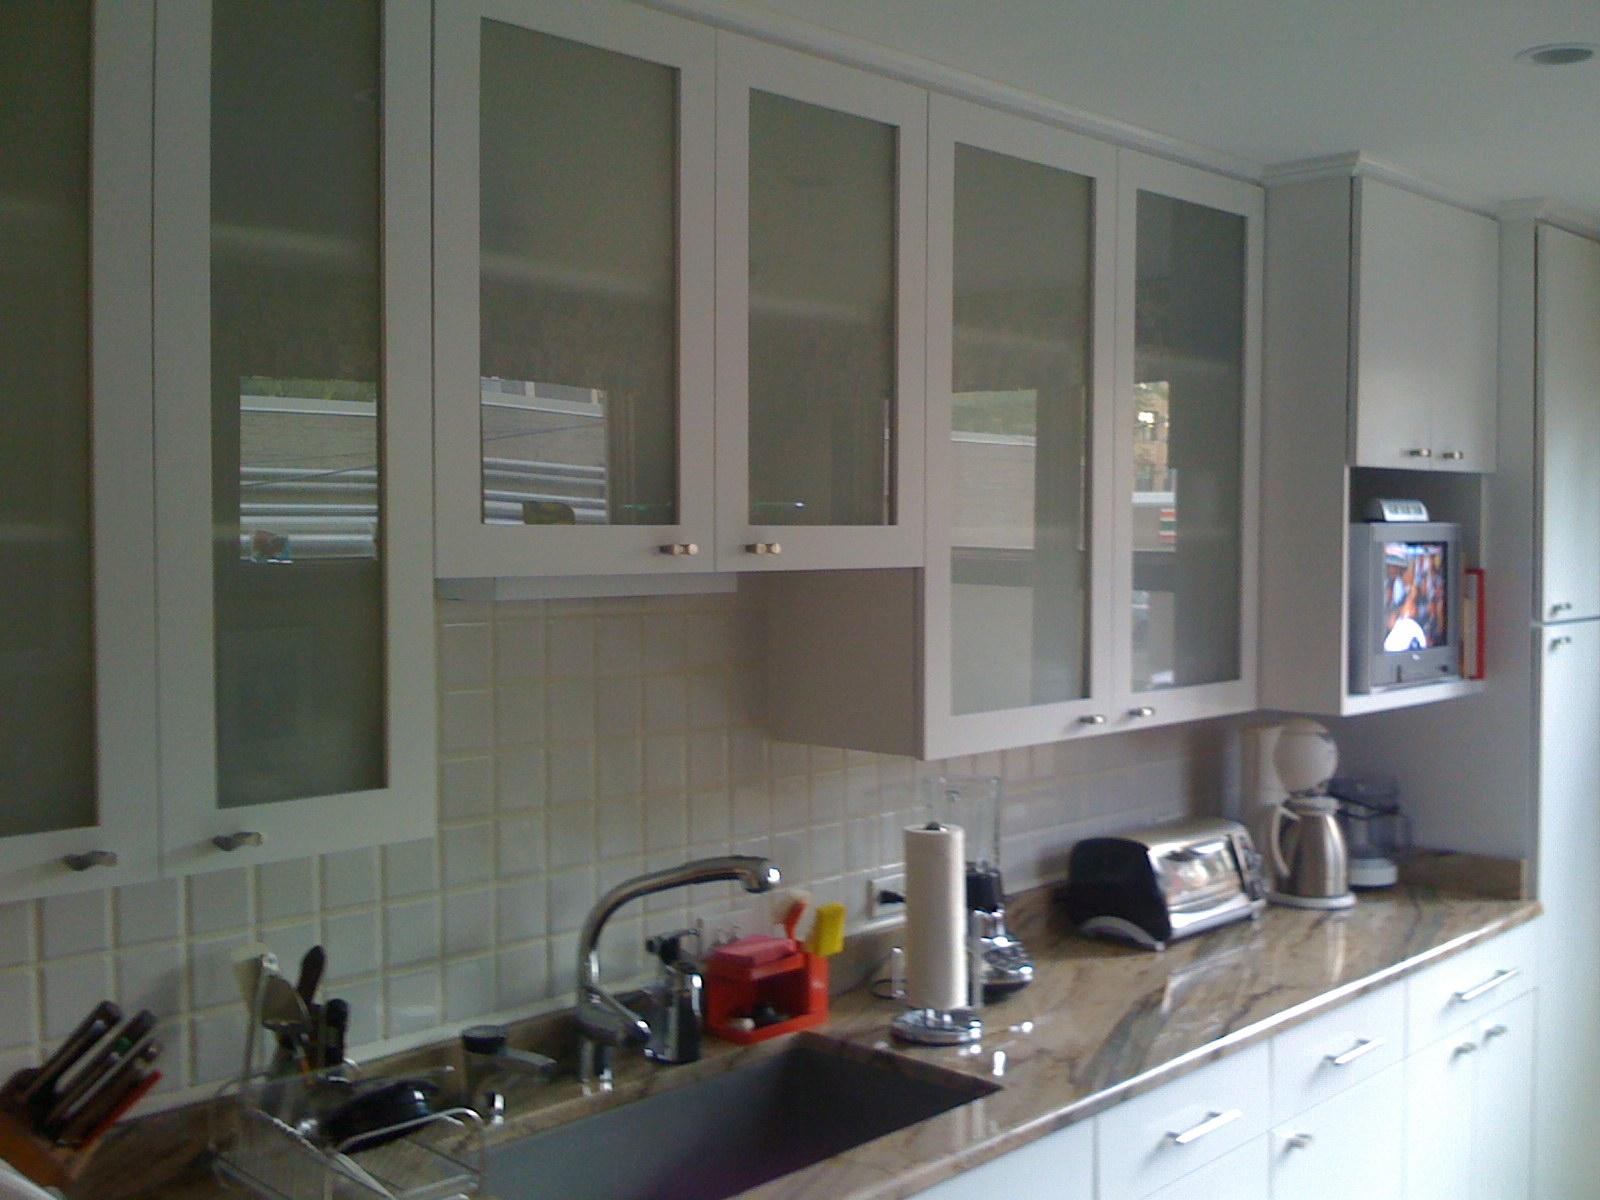 kitchen stores online images of remodeled kitchens refacing existing cabinet doors